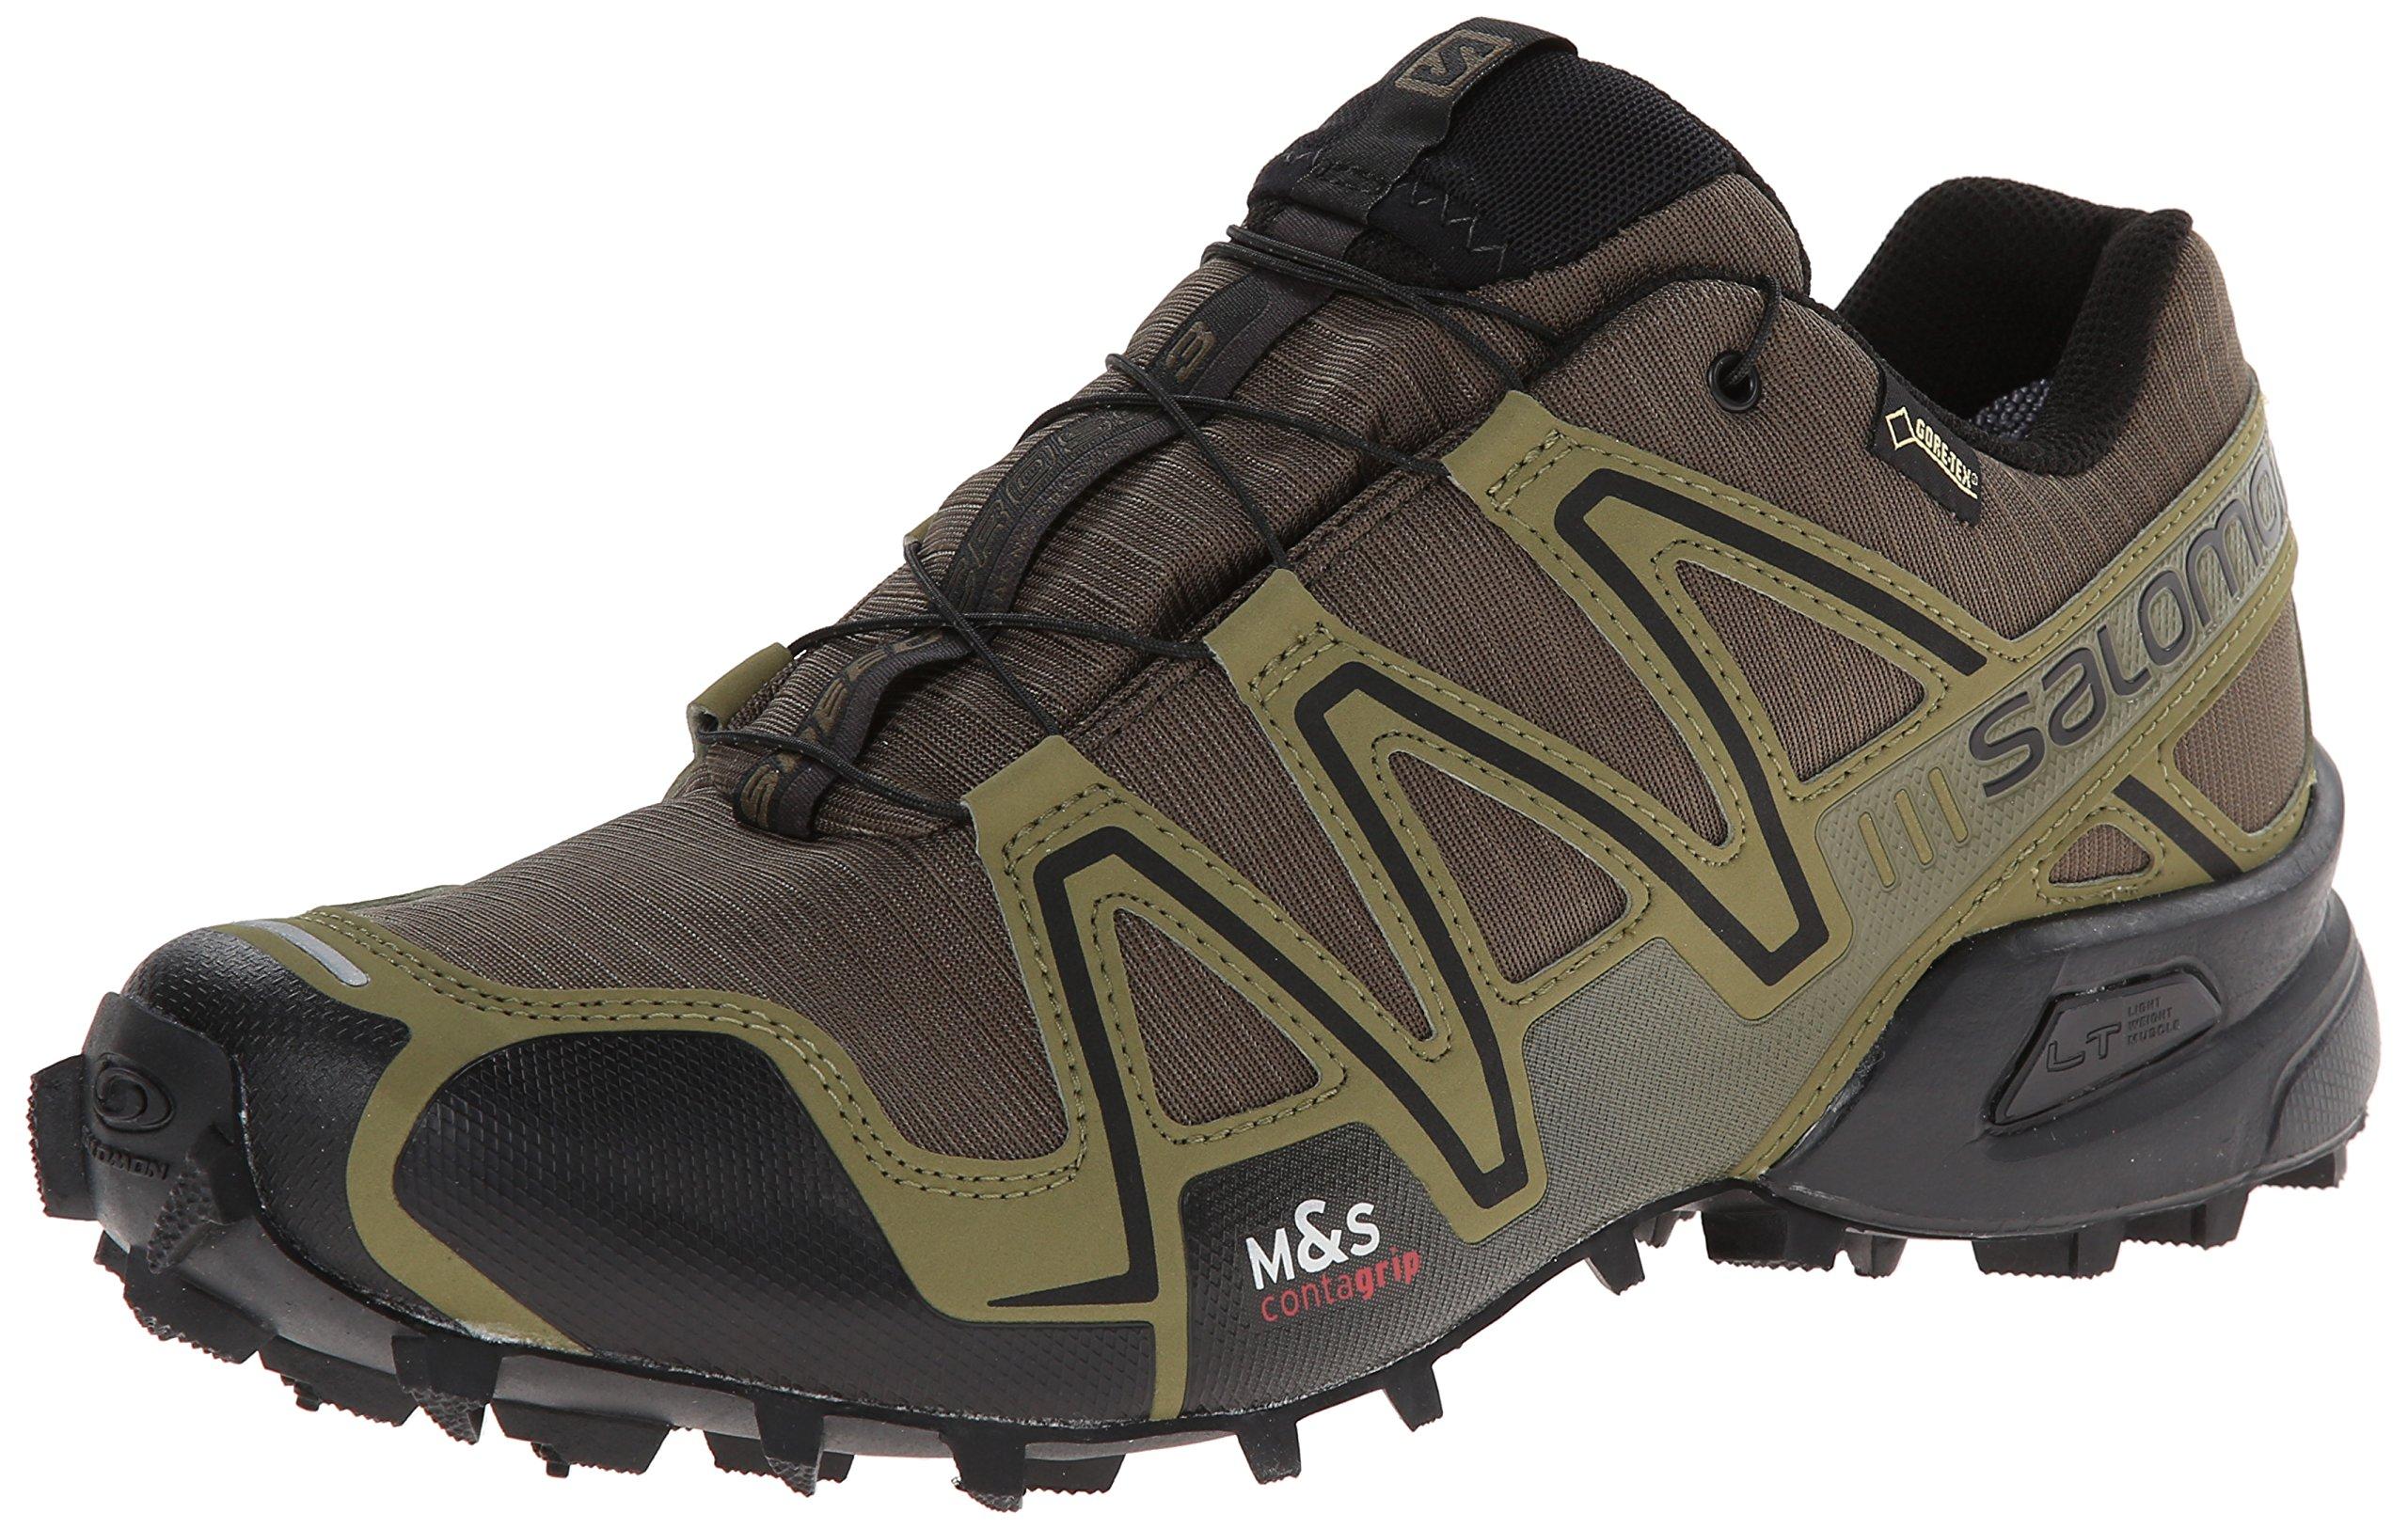 Galleon - Salomon Men's Speedcross 3 GTX Running Trail Shoe, Dark Khaki/Black/Iguana Green, 10 M US